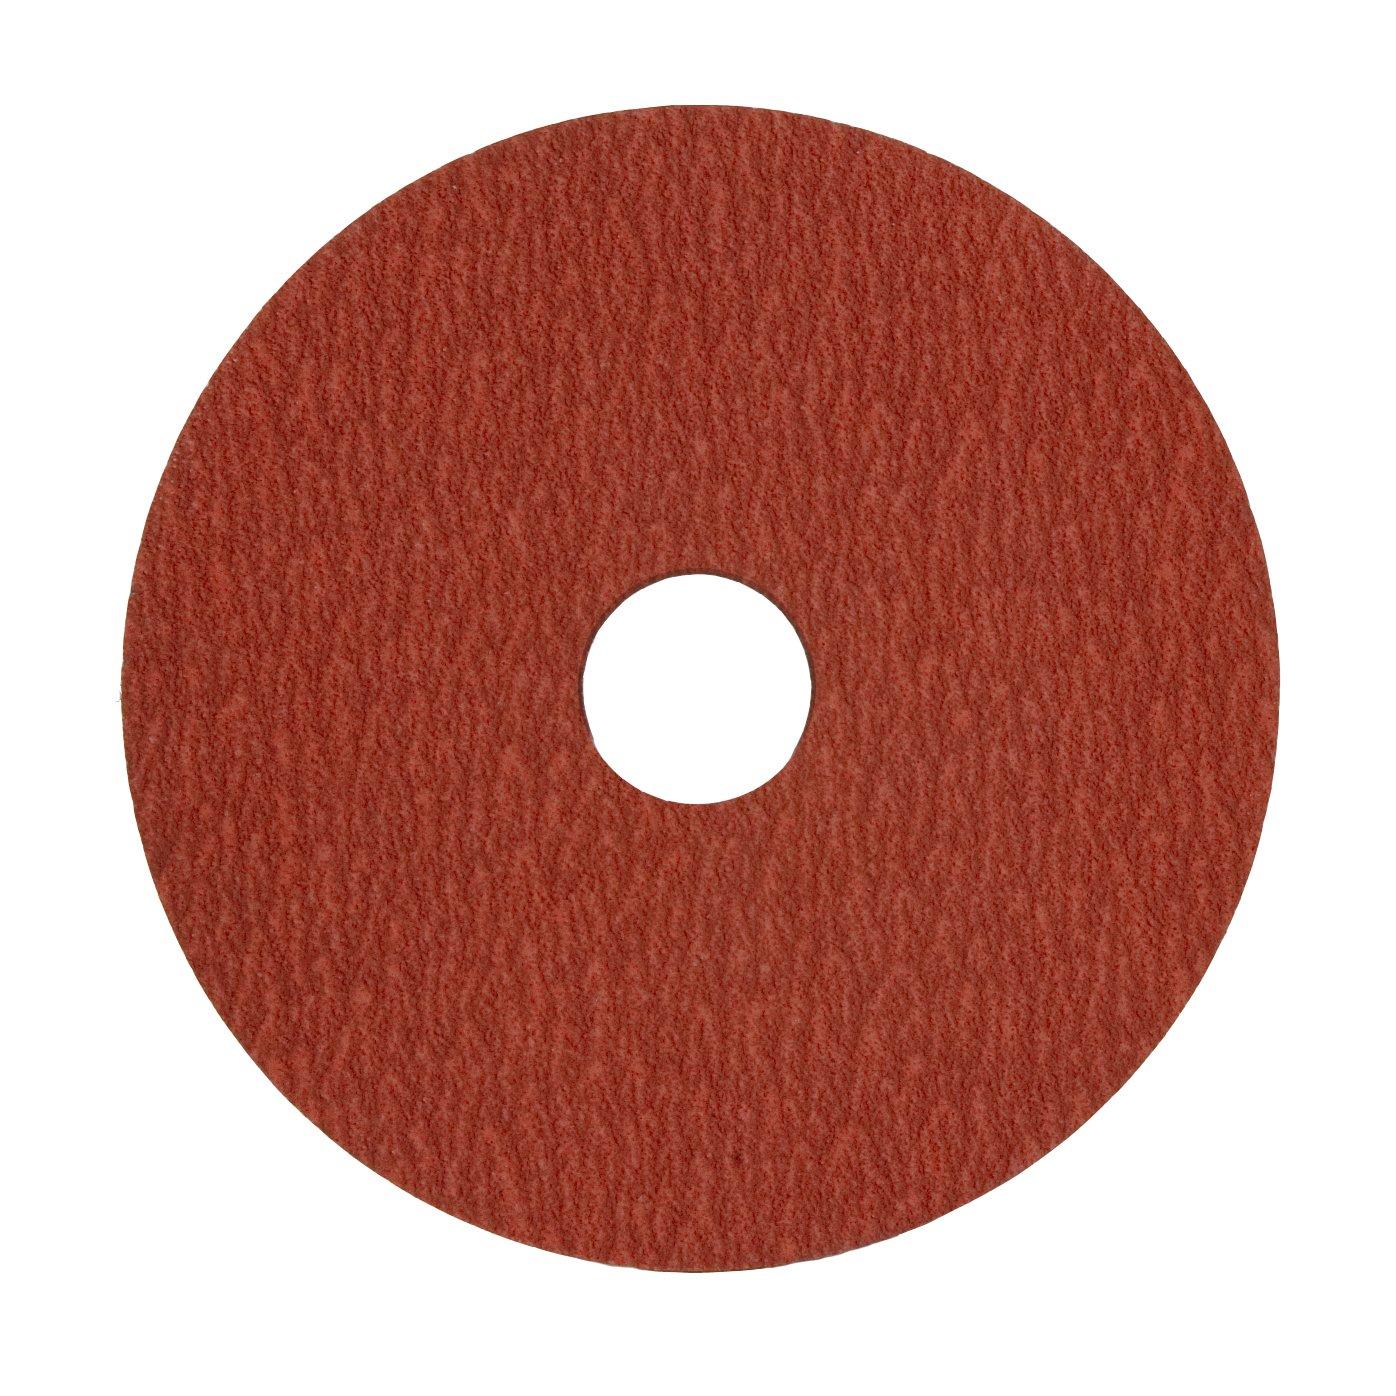 VSM 149556 Resin Fiber Disc, Red, Medium Grade, Fiber Backing, Ceramic Plus, 120 Grit, 5'' X 7/8'' Arbor Hole, Pack of 50